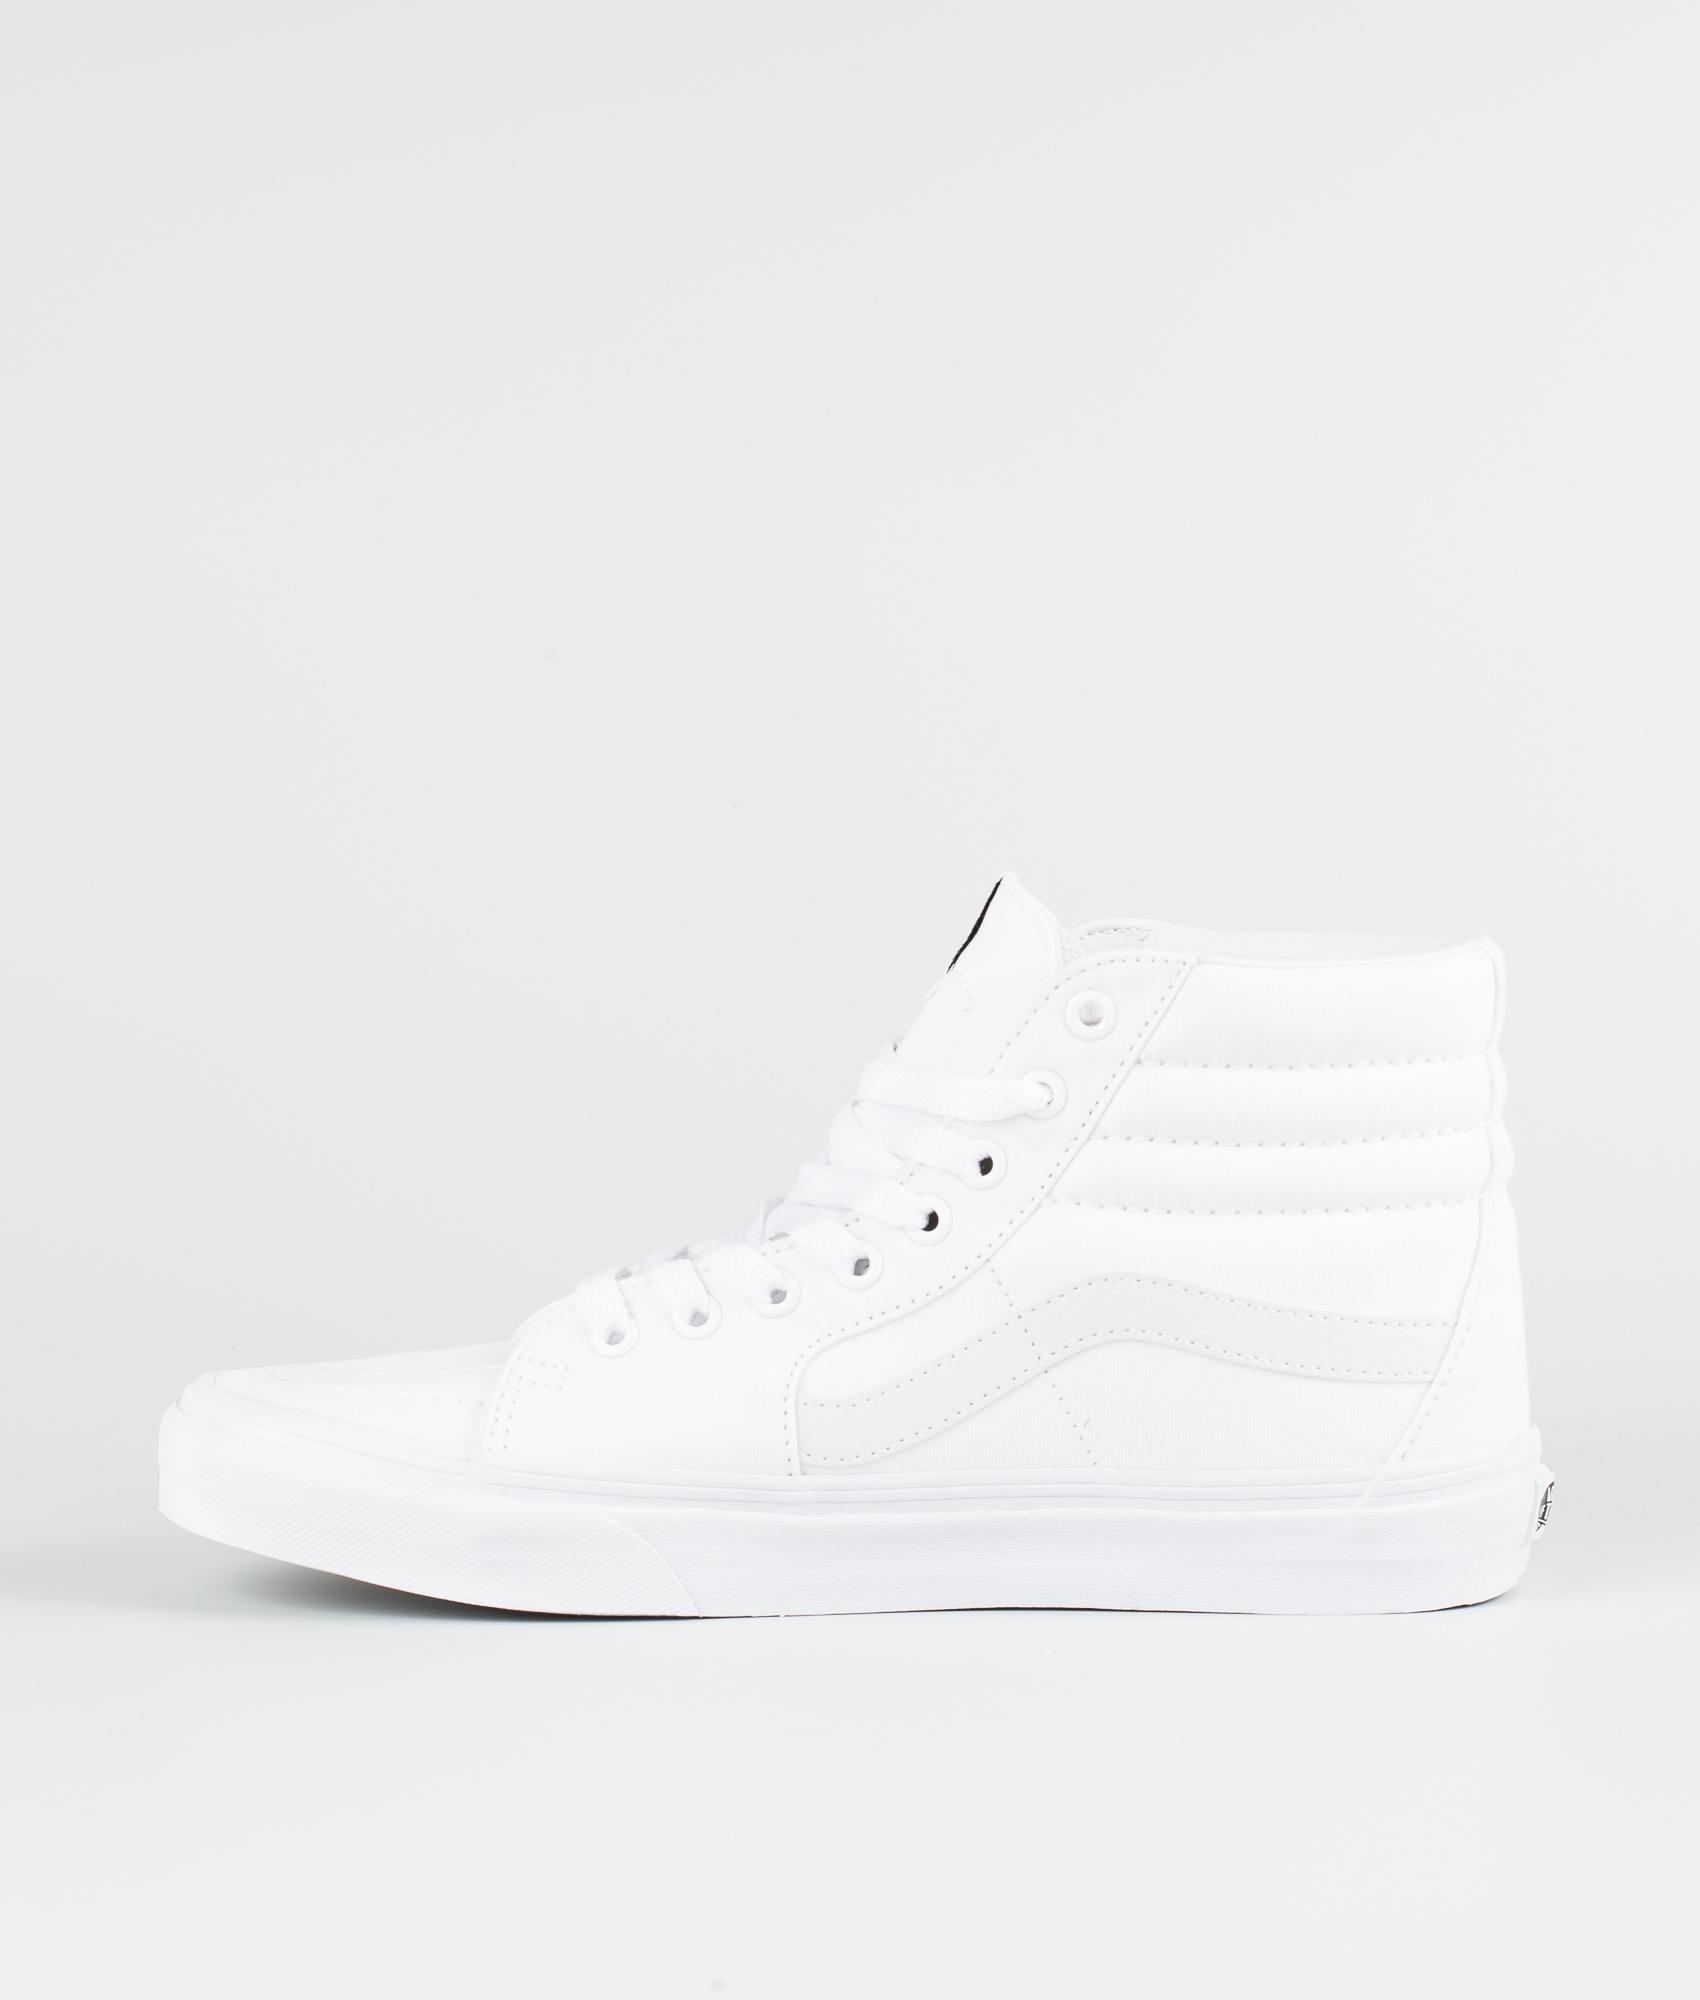 Schoenen White True Vans Sk8 Ridestore Hi Nl Ewci6iqn